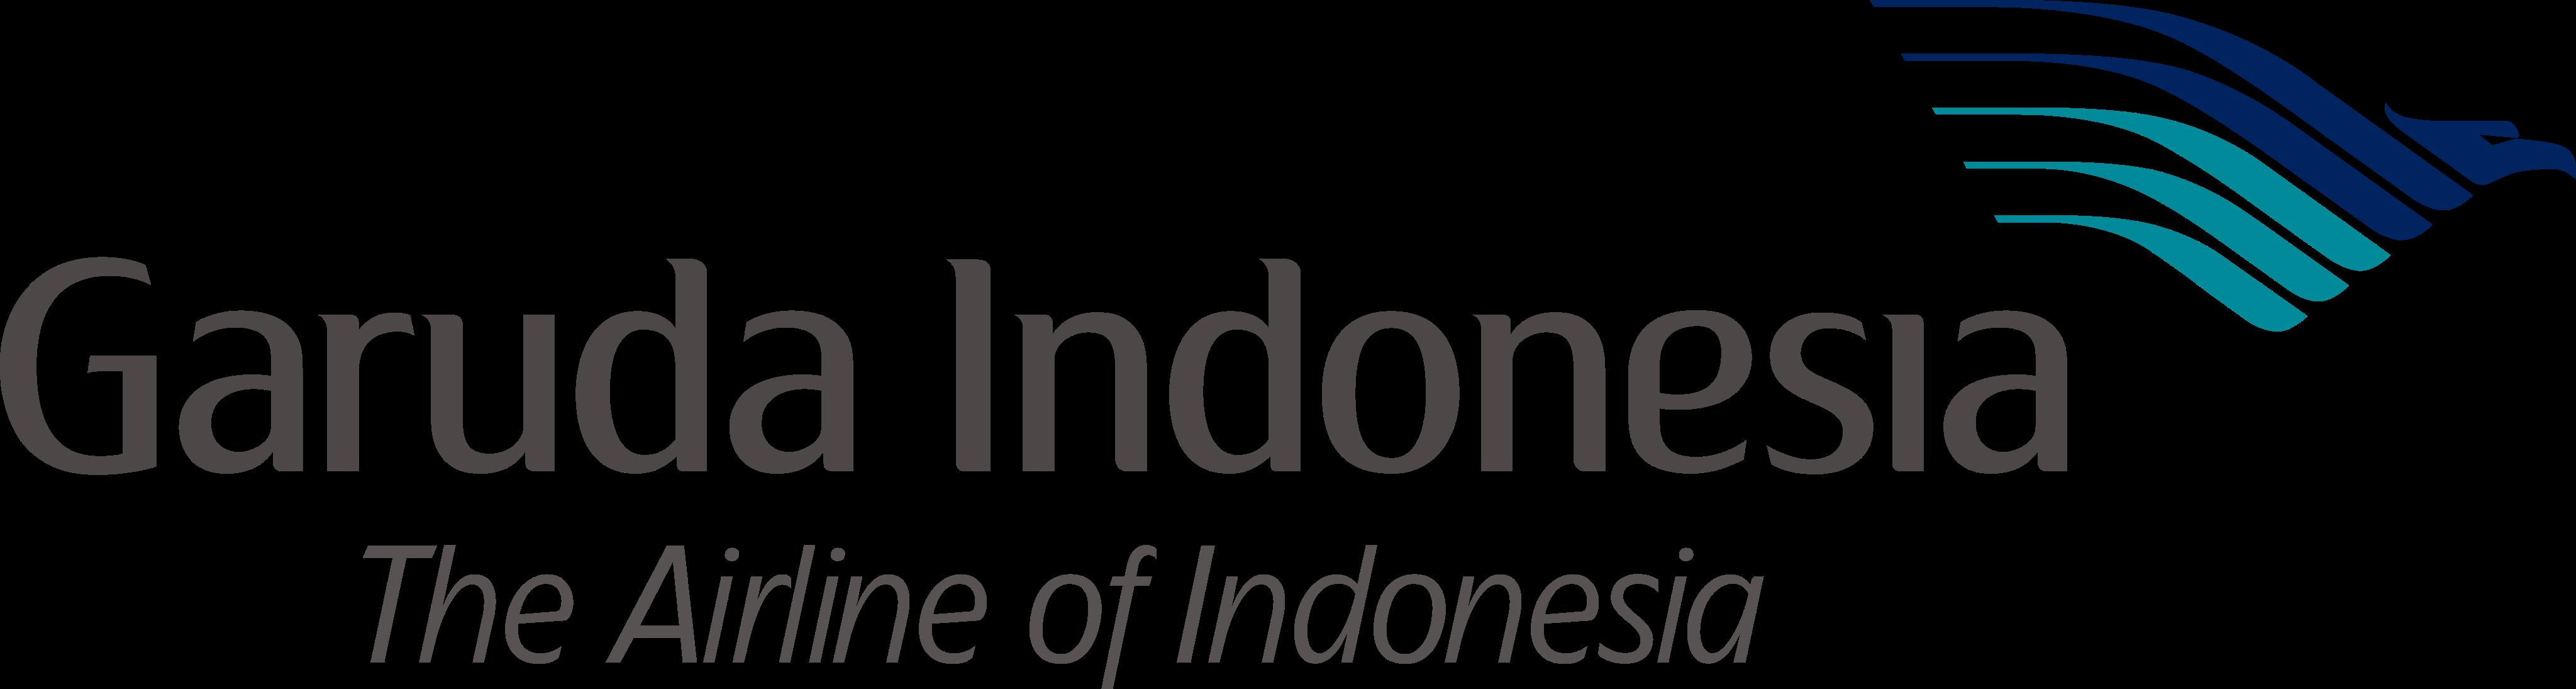 garuda indonesia logo 1 - Garuda Indonésia Airlines Logo